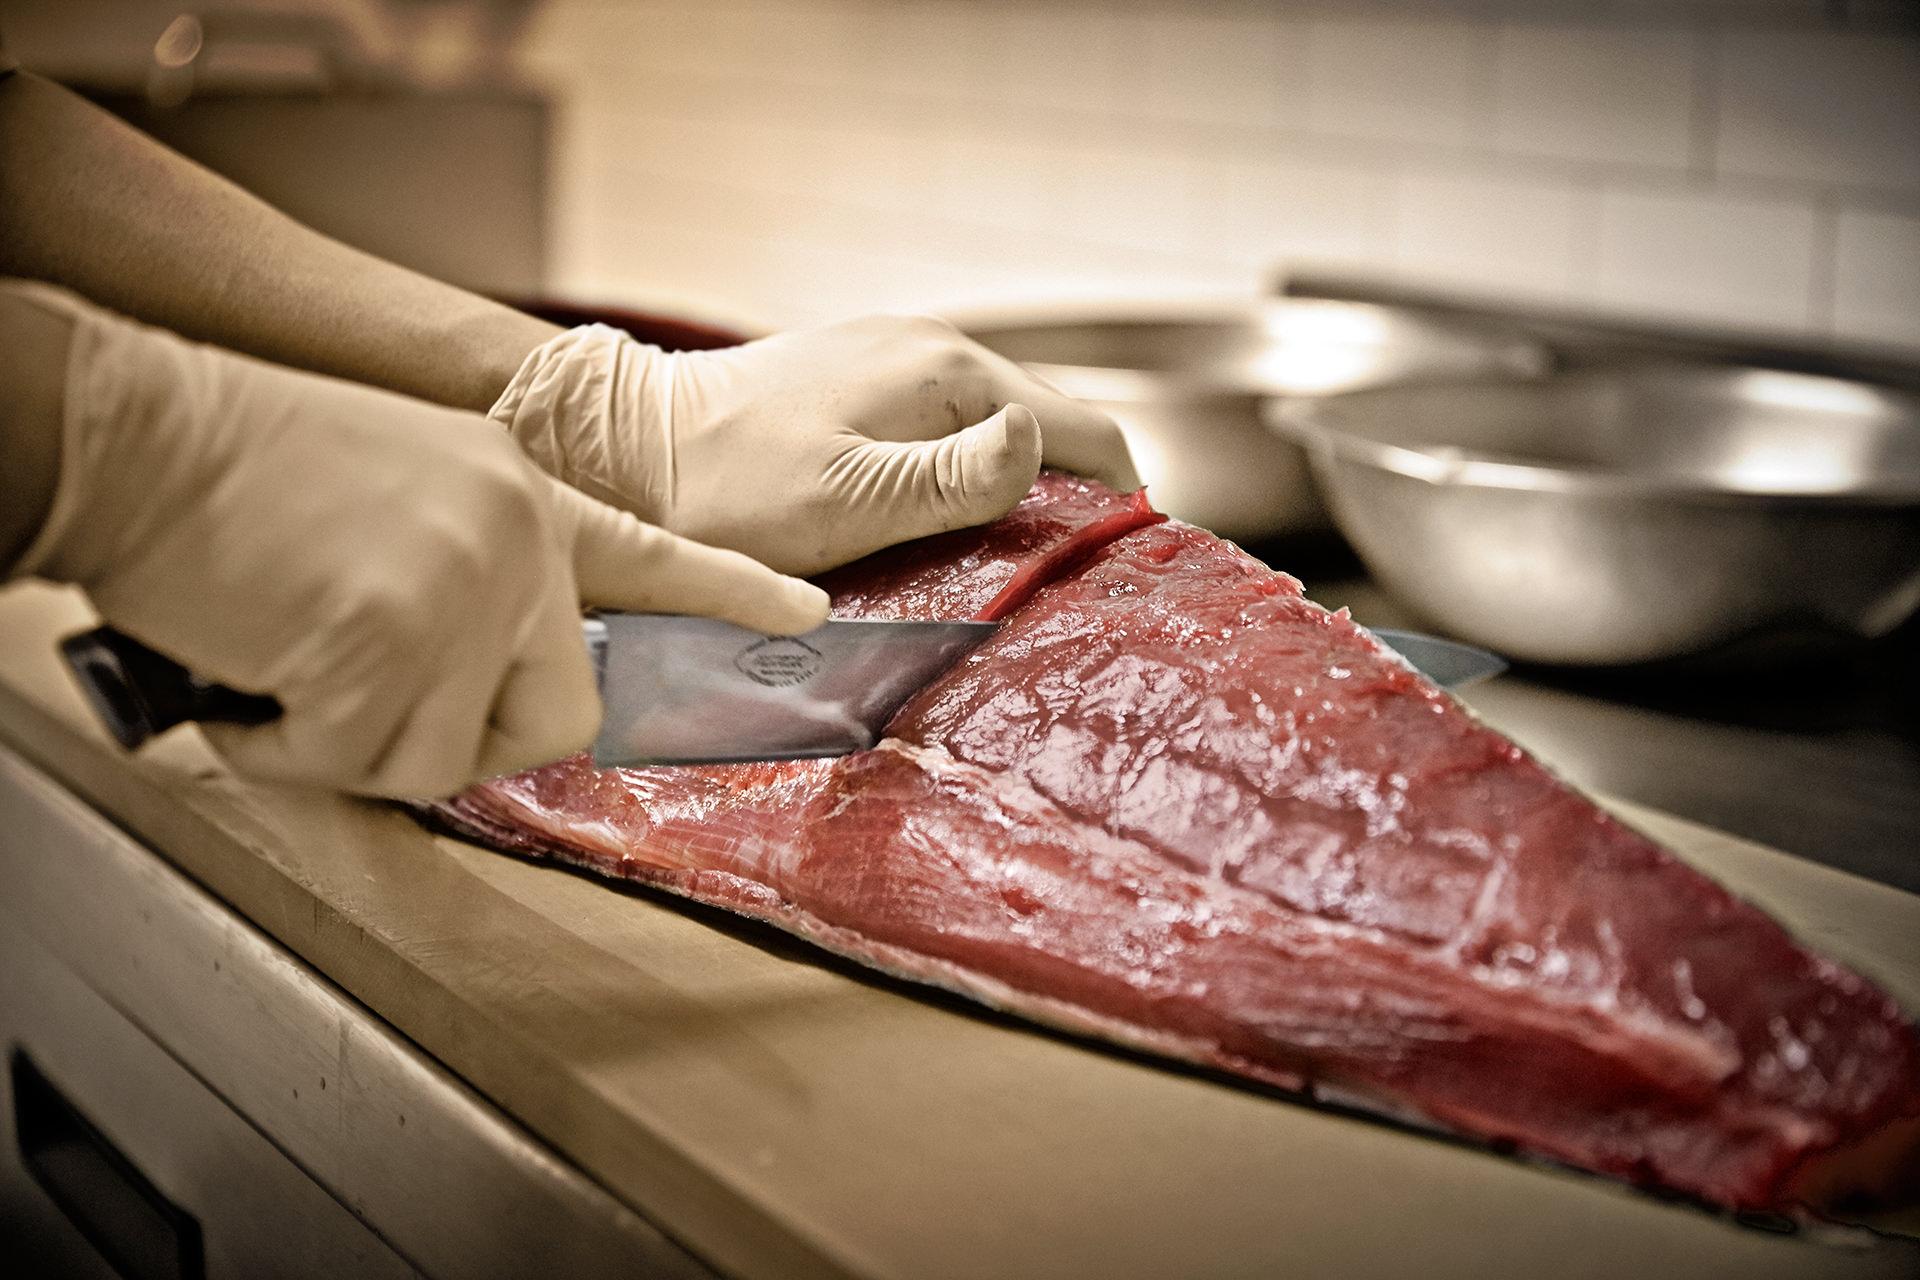 fish-cutting-knife-restaurant-japanese